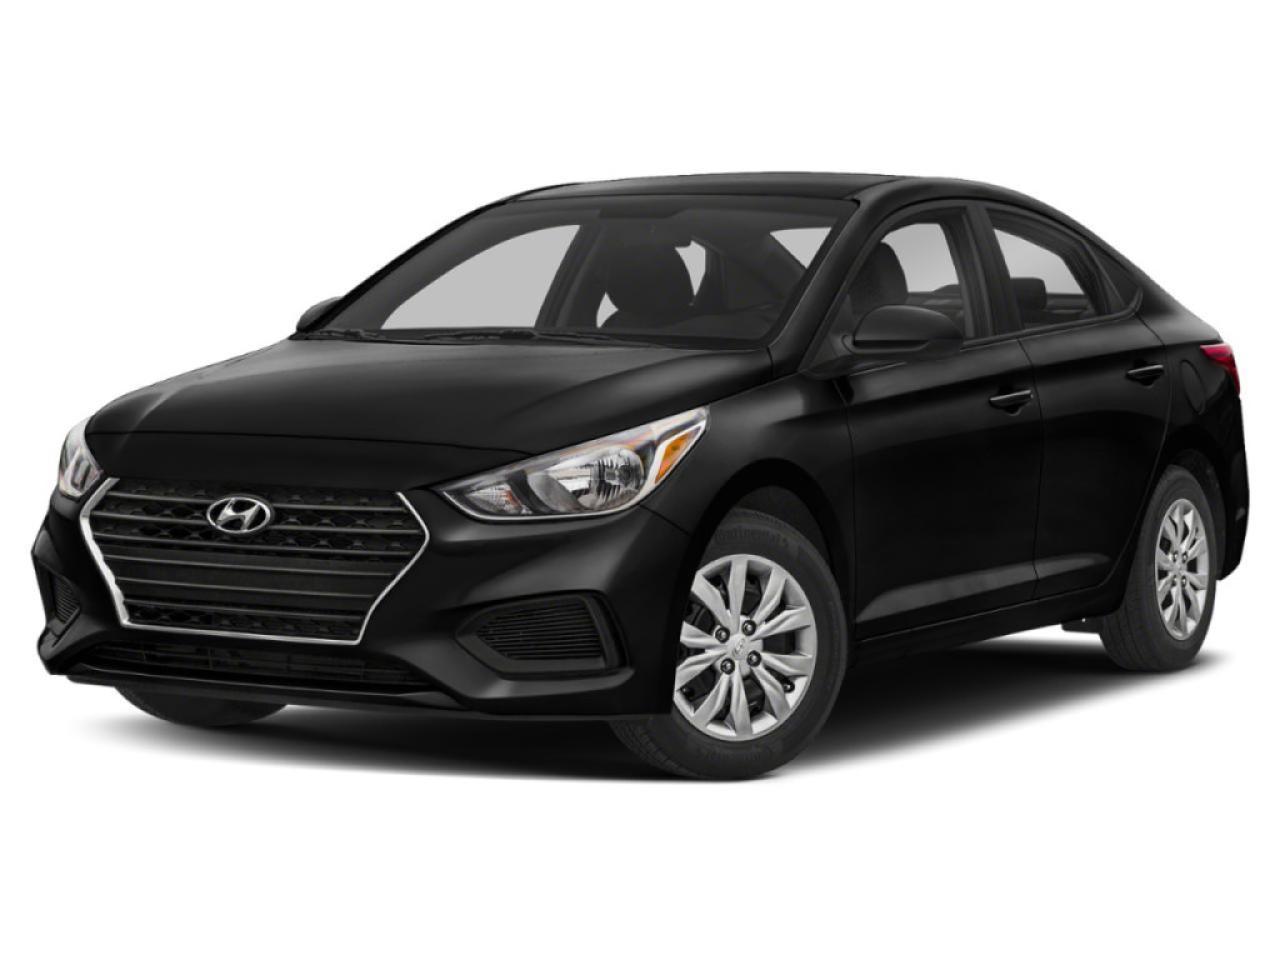 2019 Hyundai Accent Preferred 5 Doors NO OPTIONS